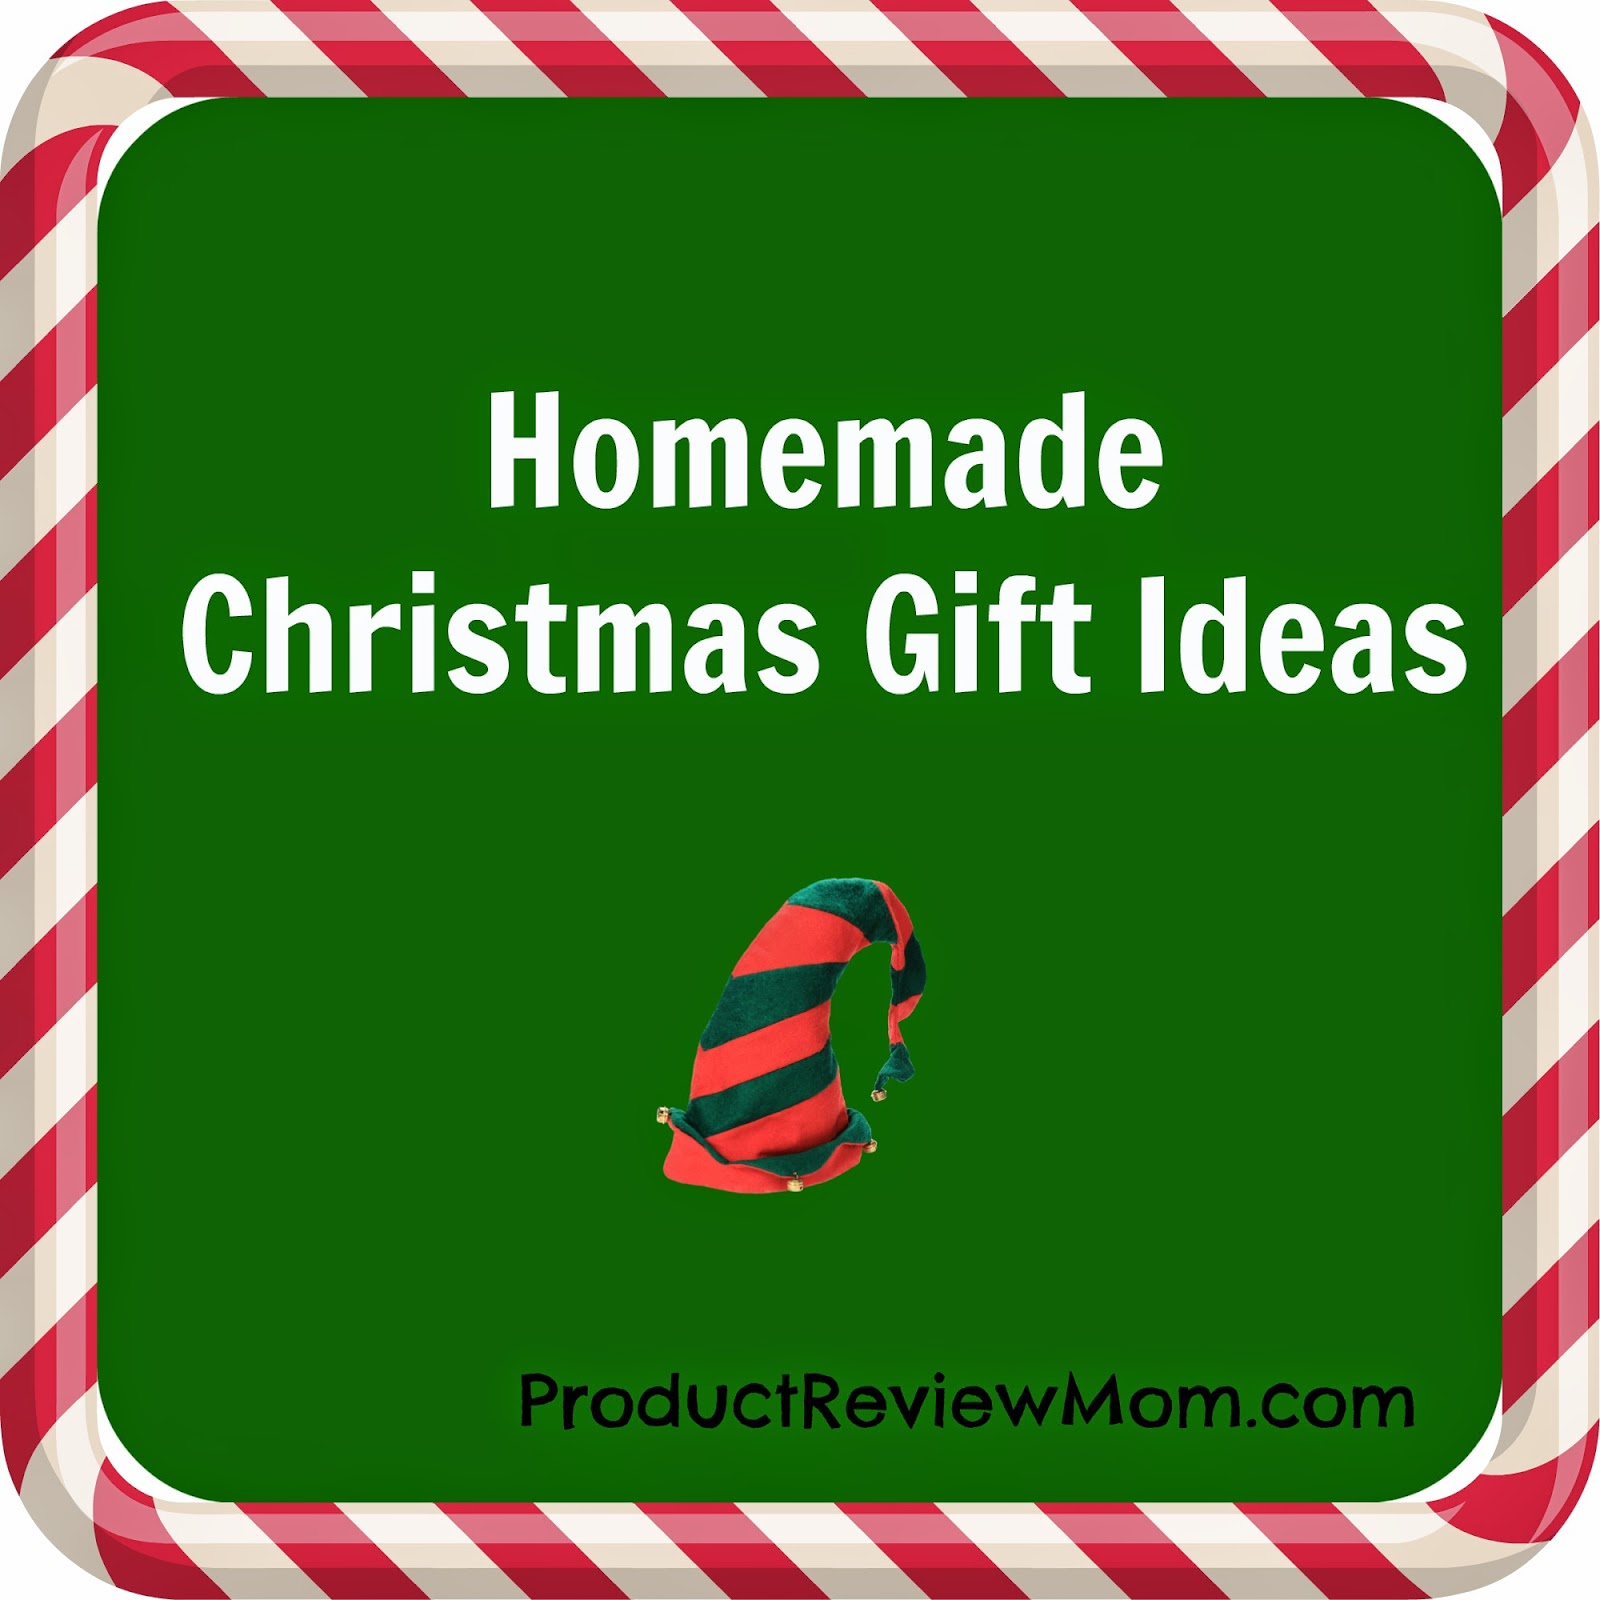 Homemade christmas gift ideas holidaygiftguide for Homemade christmas gift ideas for adults